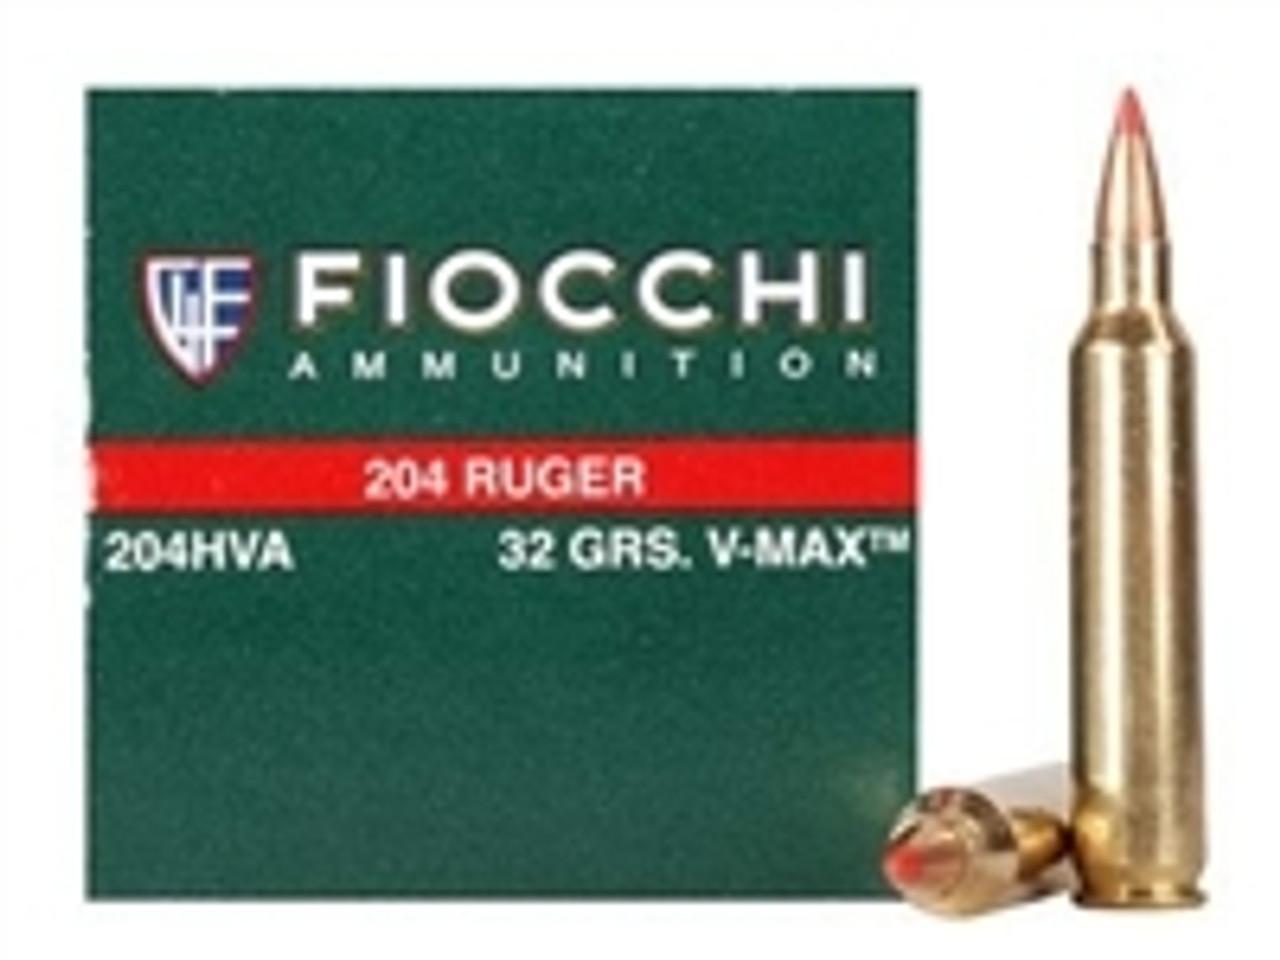 204 Ruger Ammo